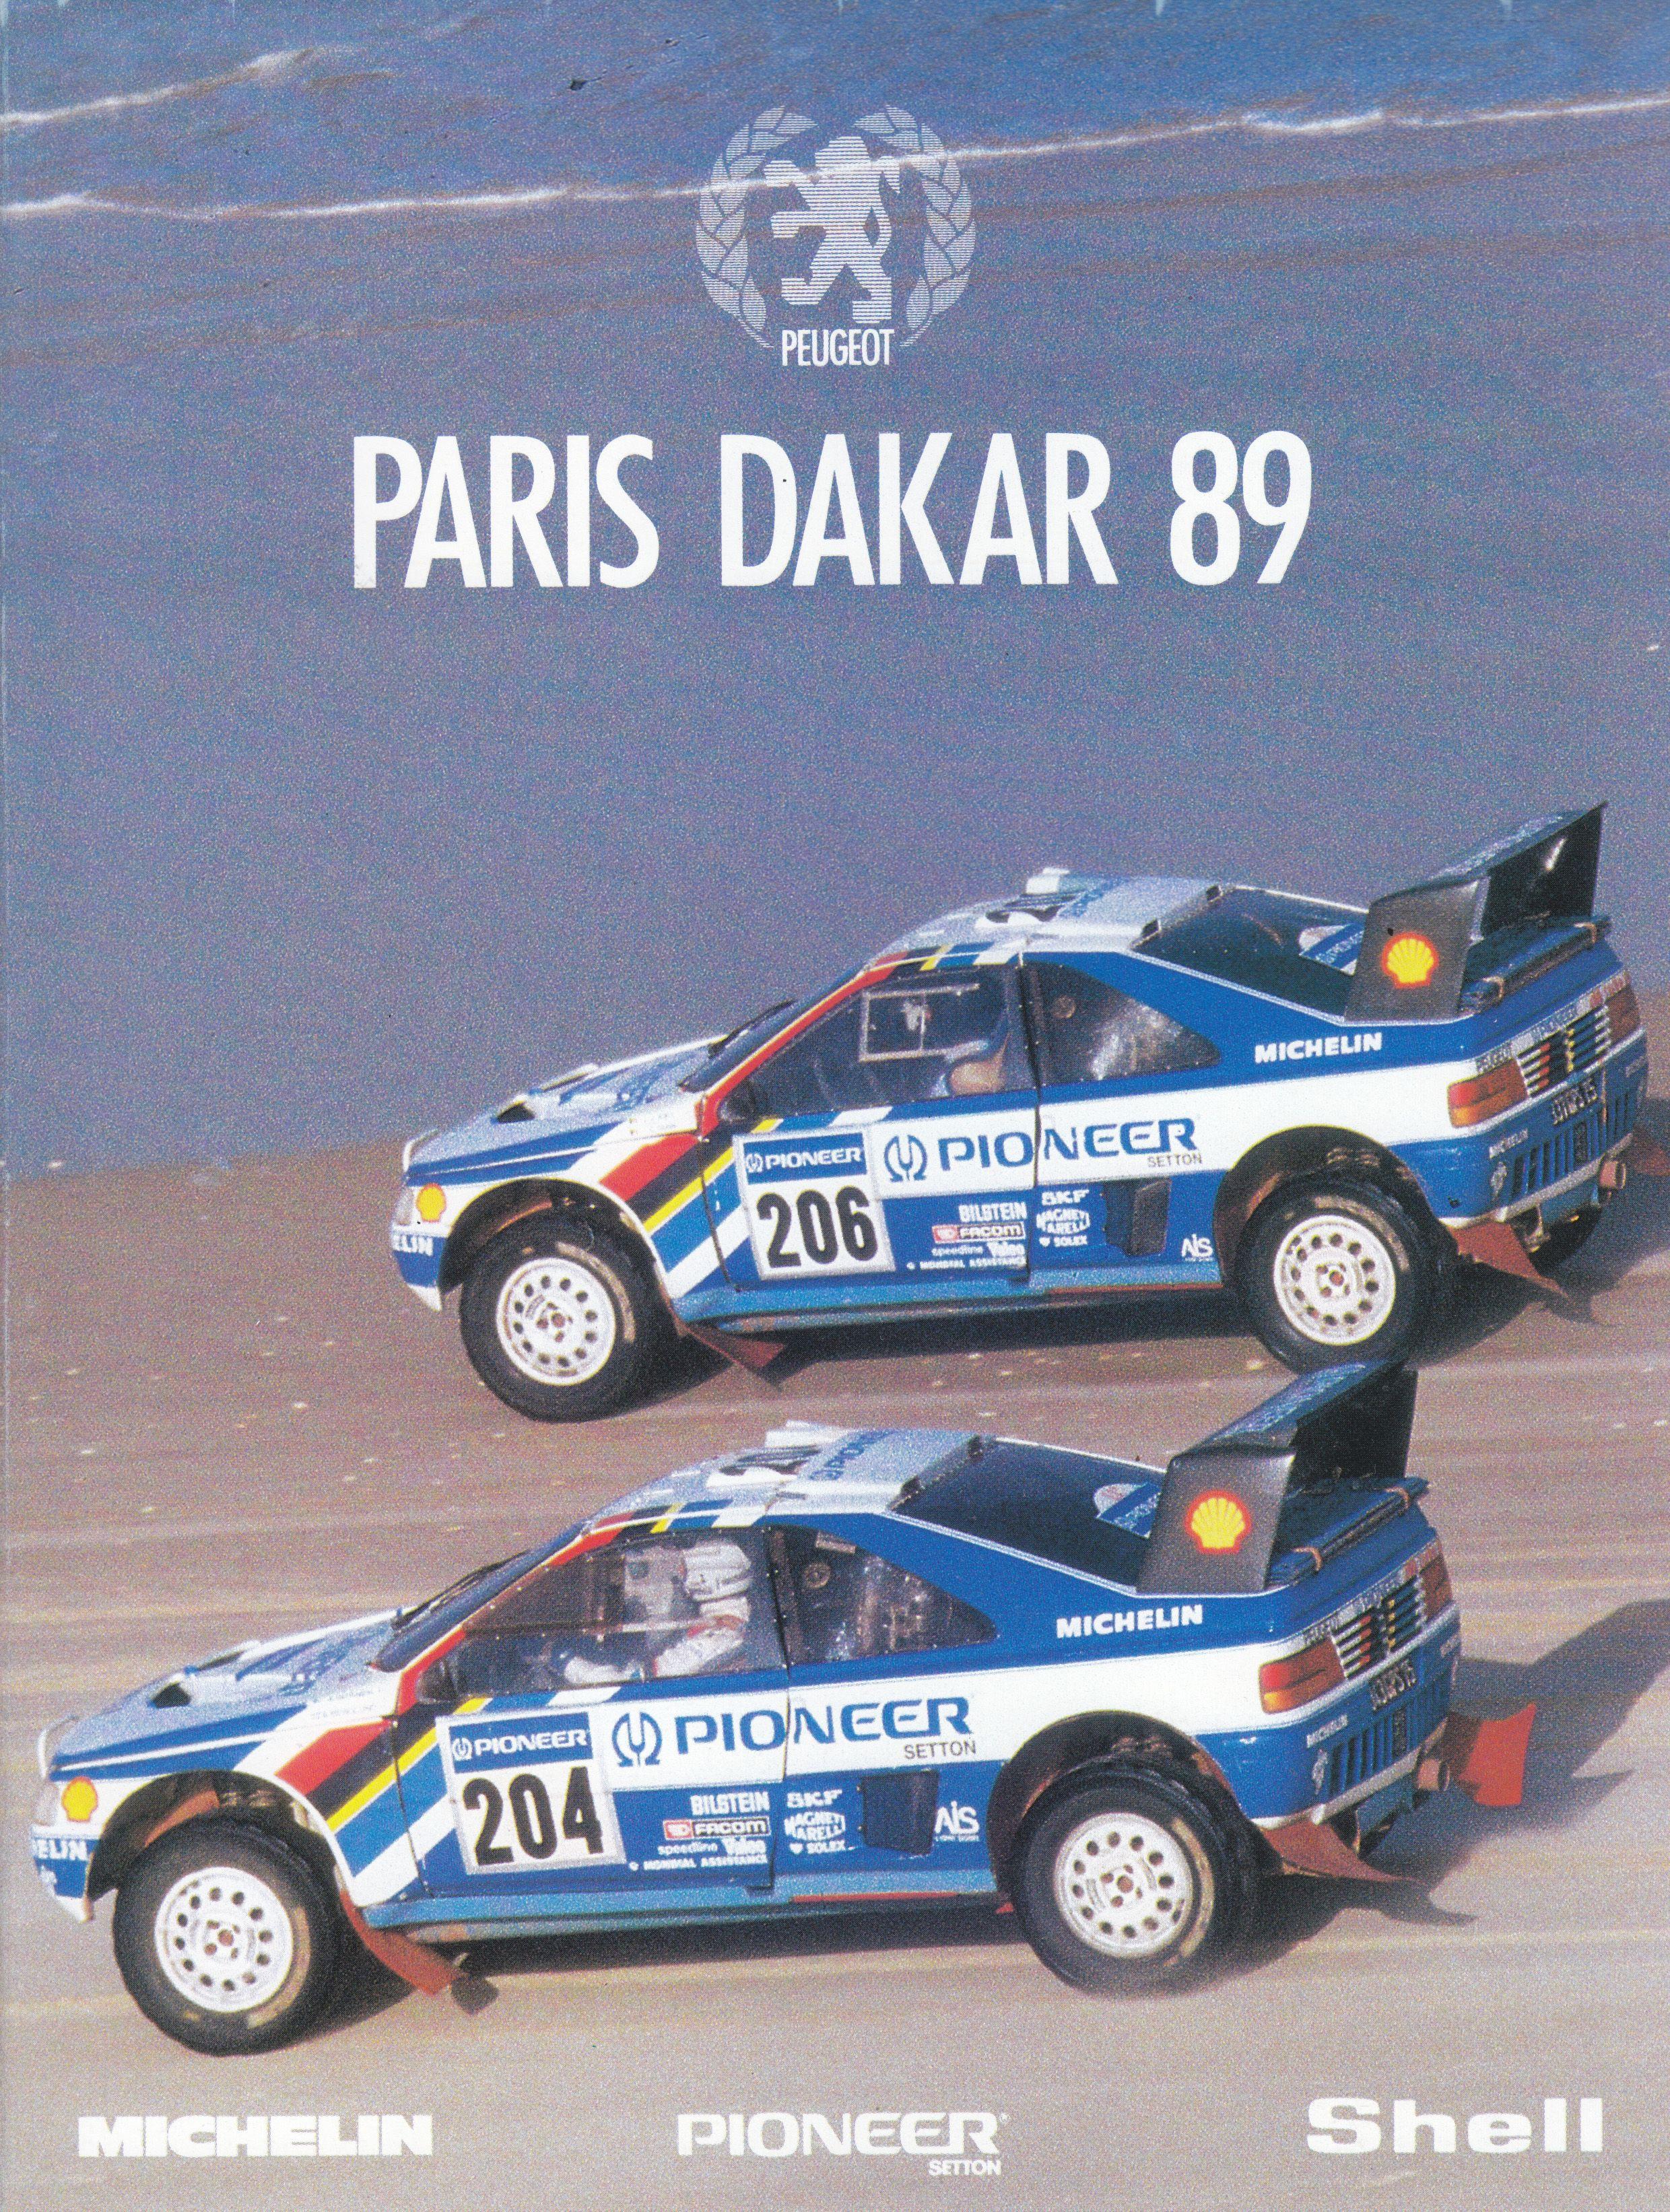 Peugeot rallye car ParisDakar 1989 foldout poster